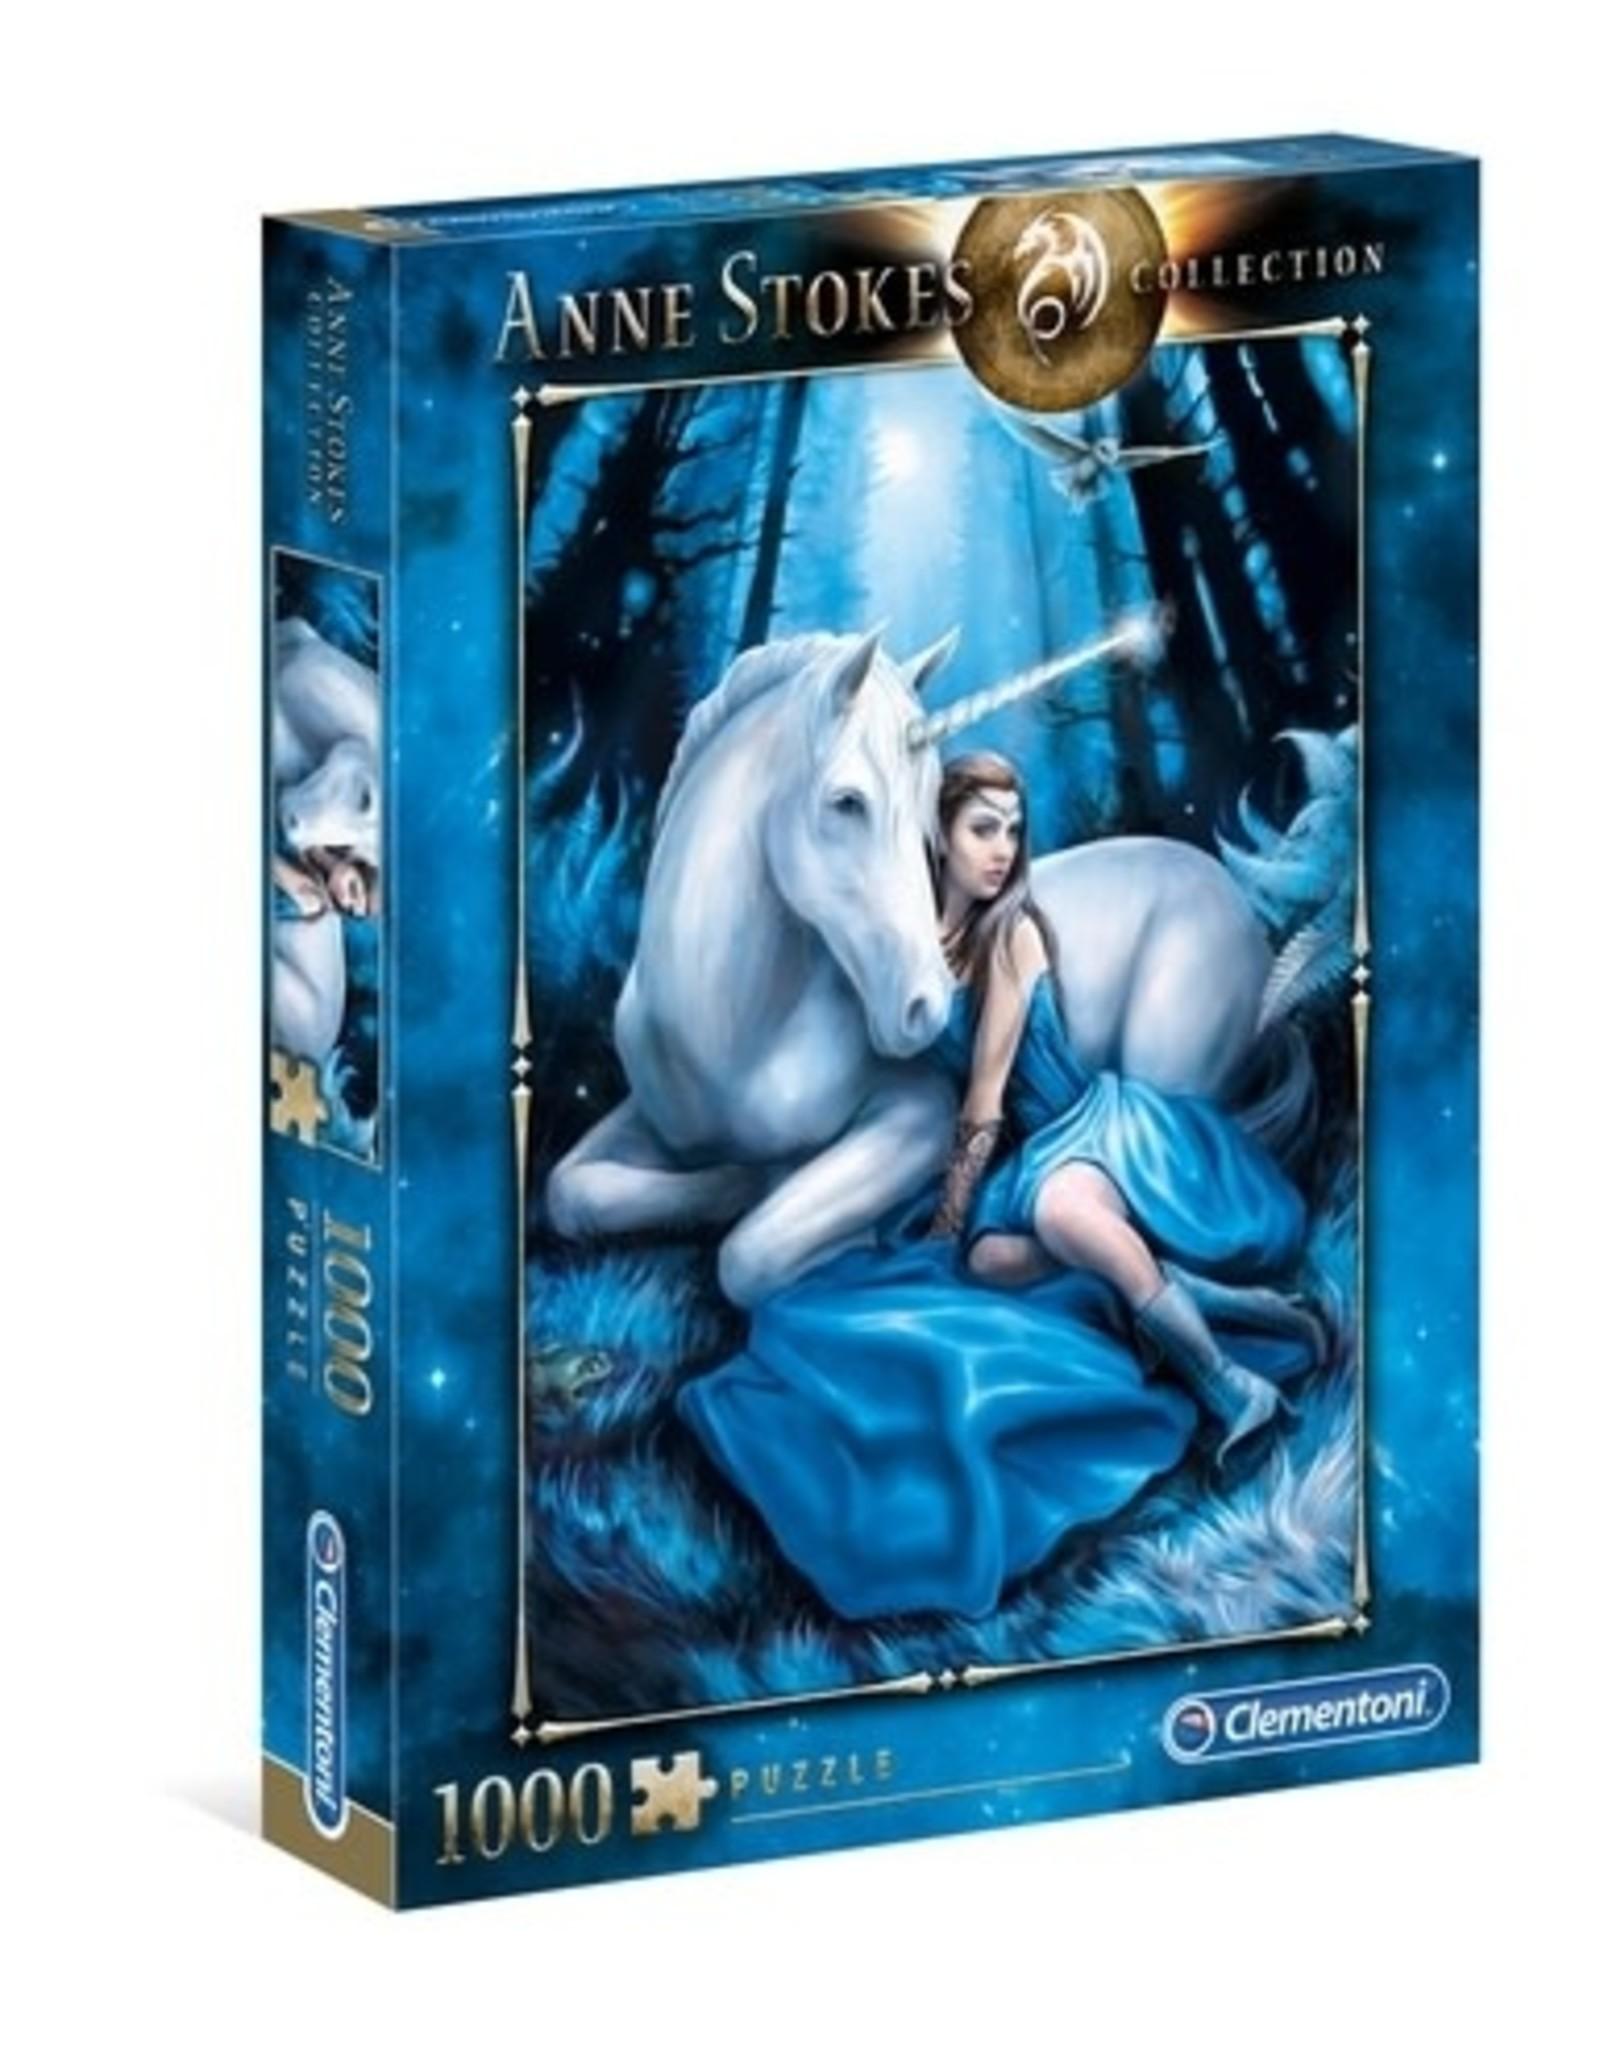 Clementoni Puzzles Anne Stokes - Blue Moon, 1000 pc puzzle - NEW